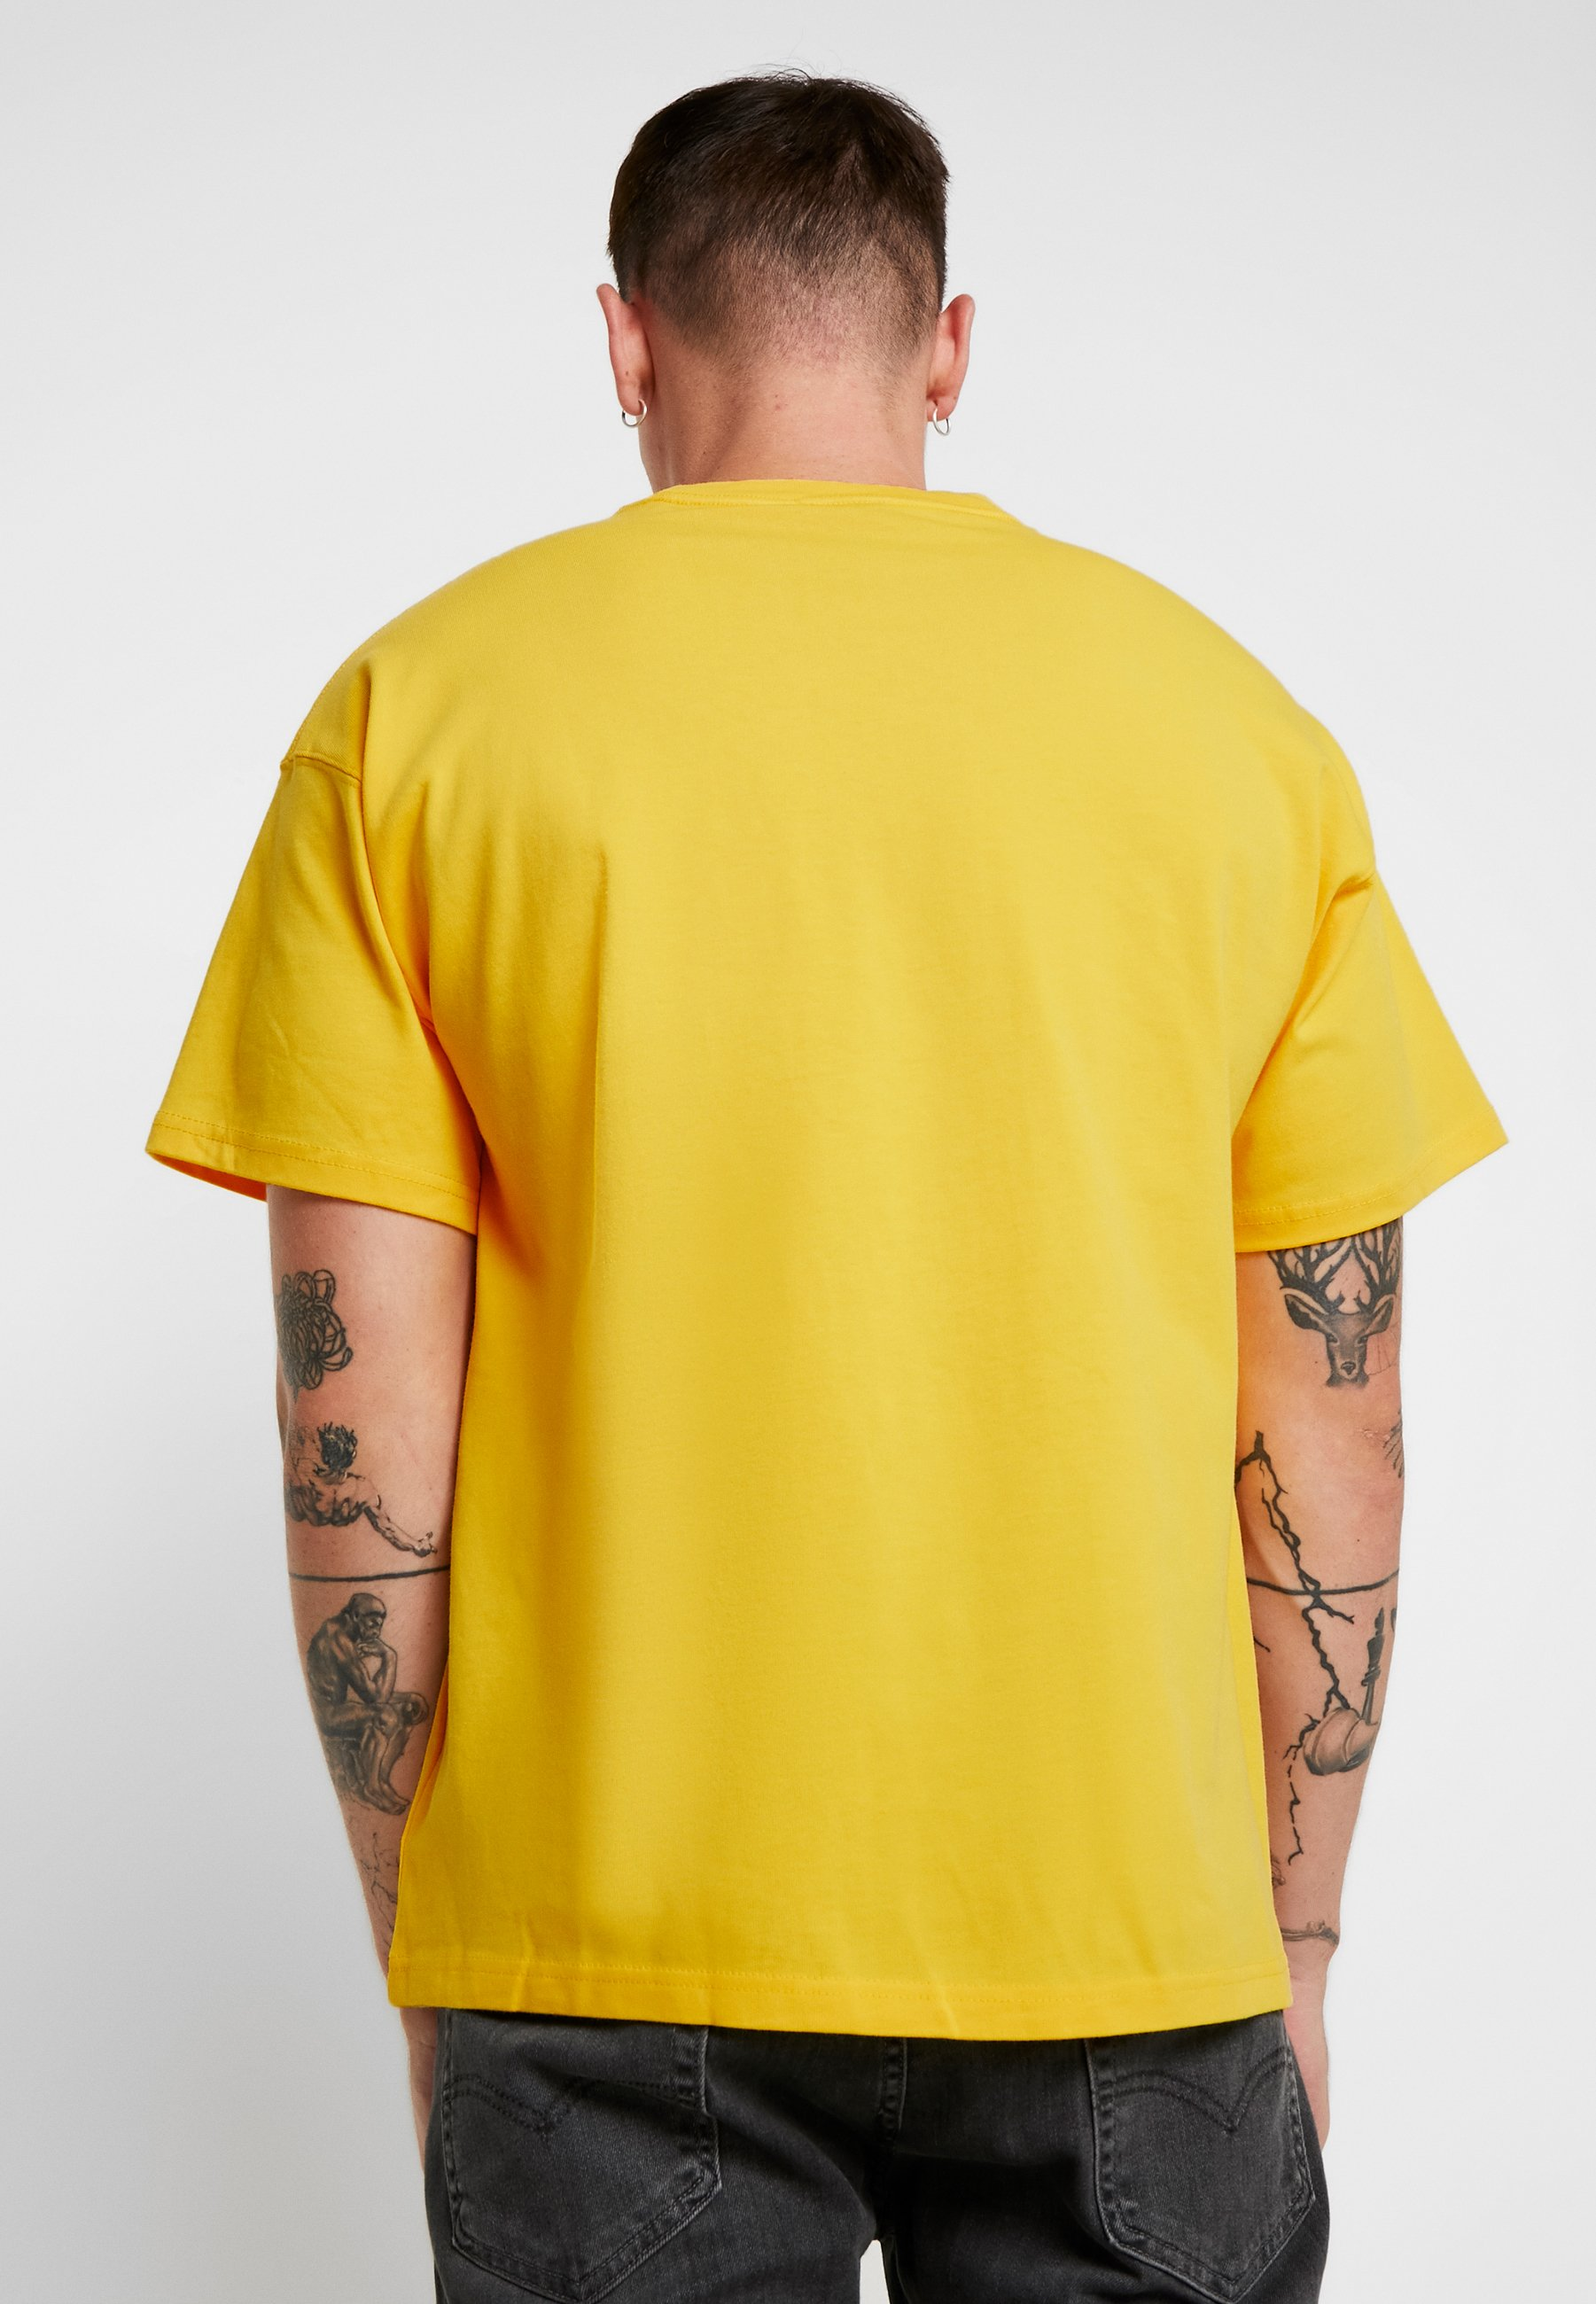 Imprimé shirt Sportswear Nike Tee LogoT Amarillo YgyIvbfm76